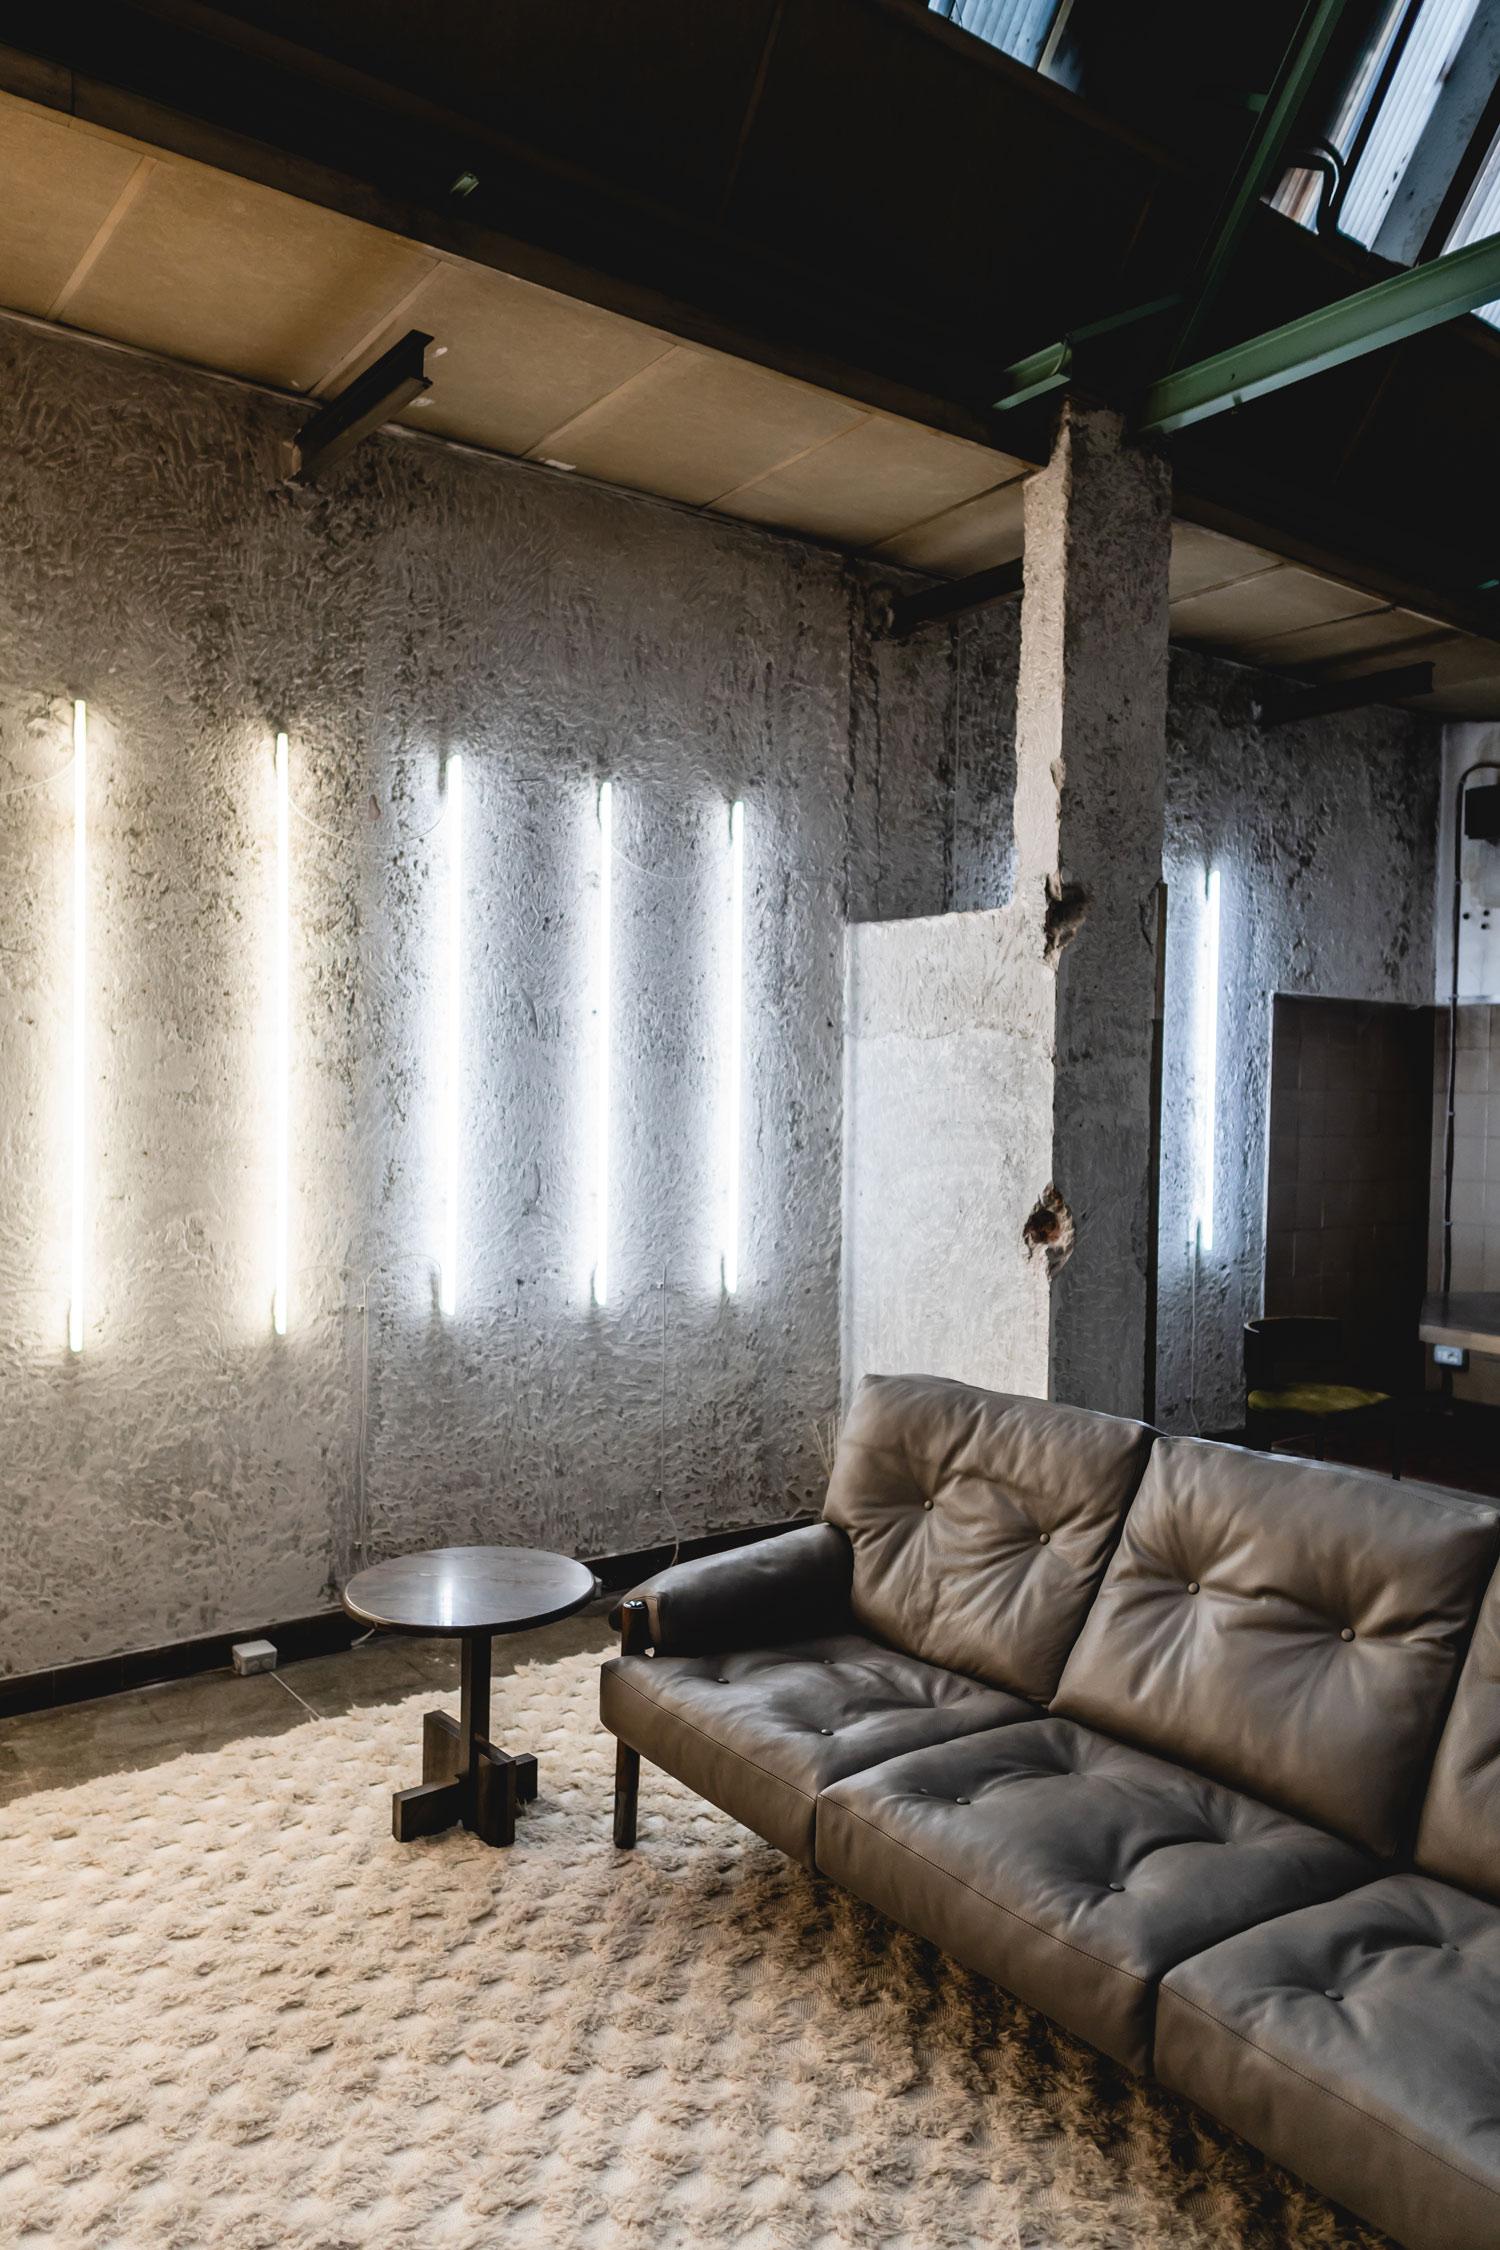 Interior design trends for 2020_Interior design trends 2020_neon interior design _Authentic Interior design blog